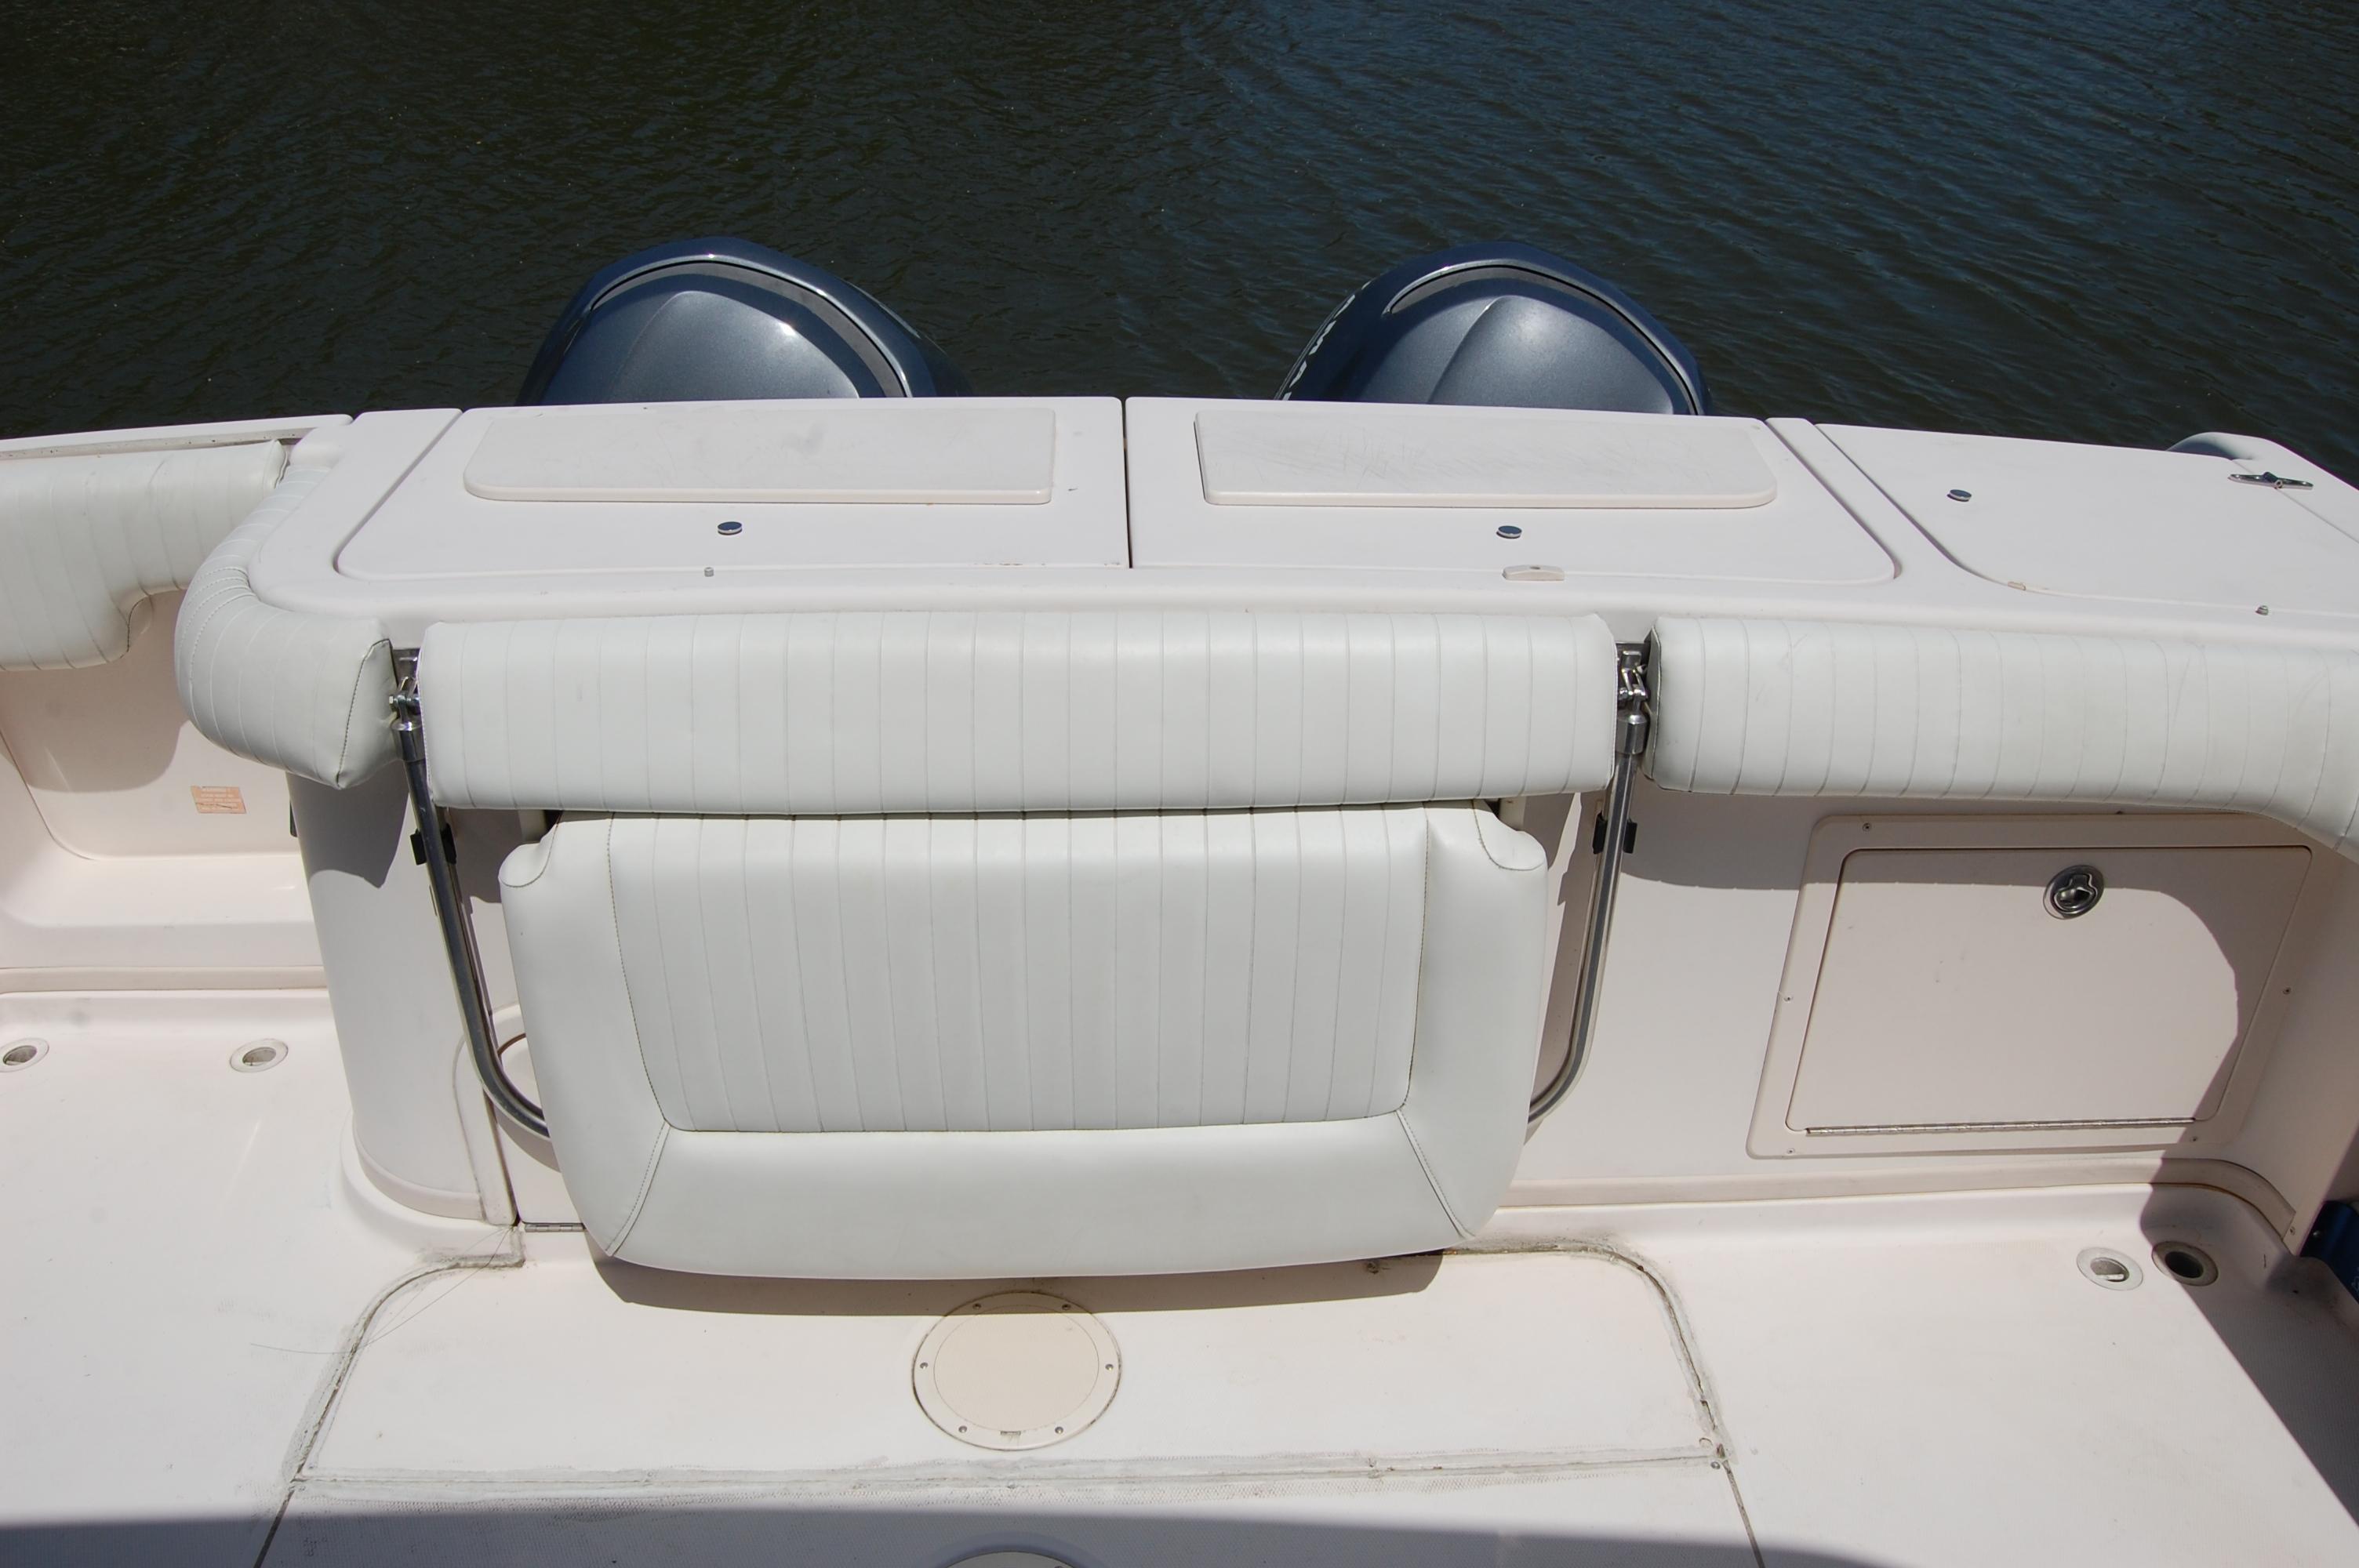 2002 Grady White 330 Express, folding transom seat